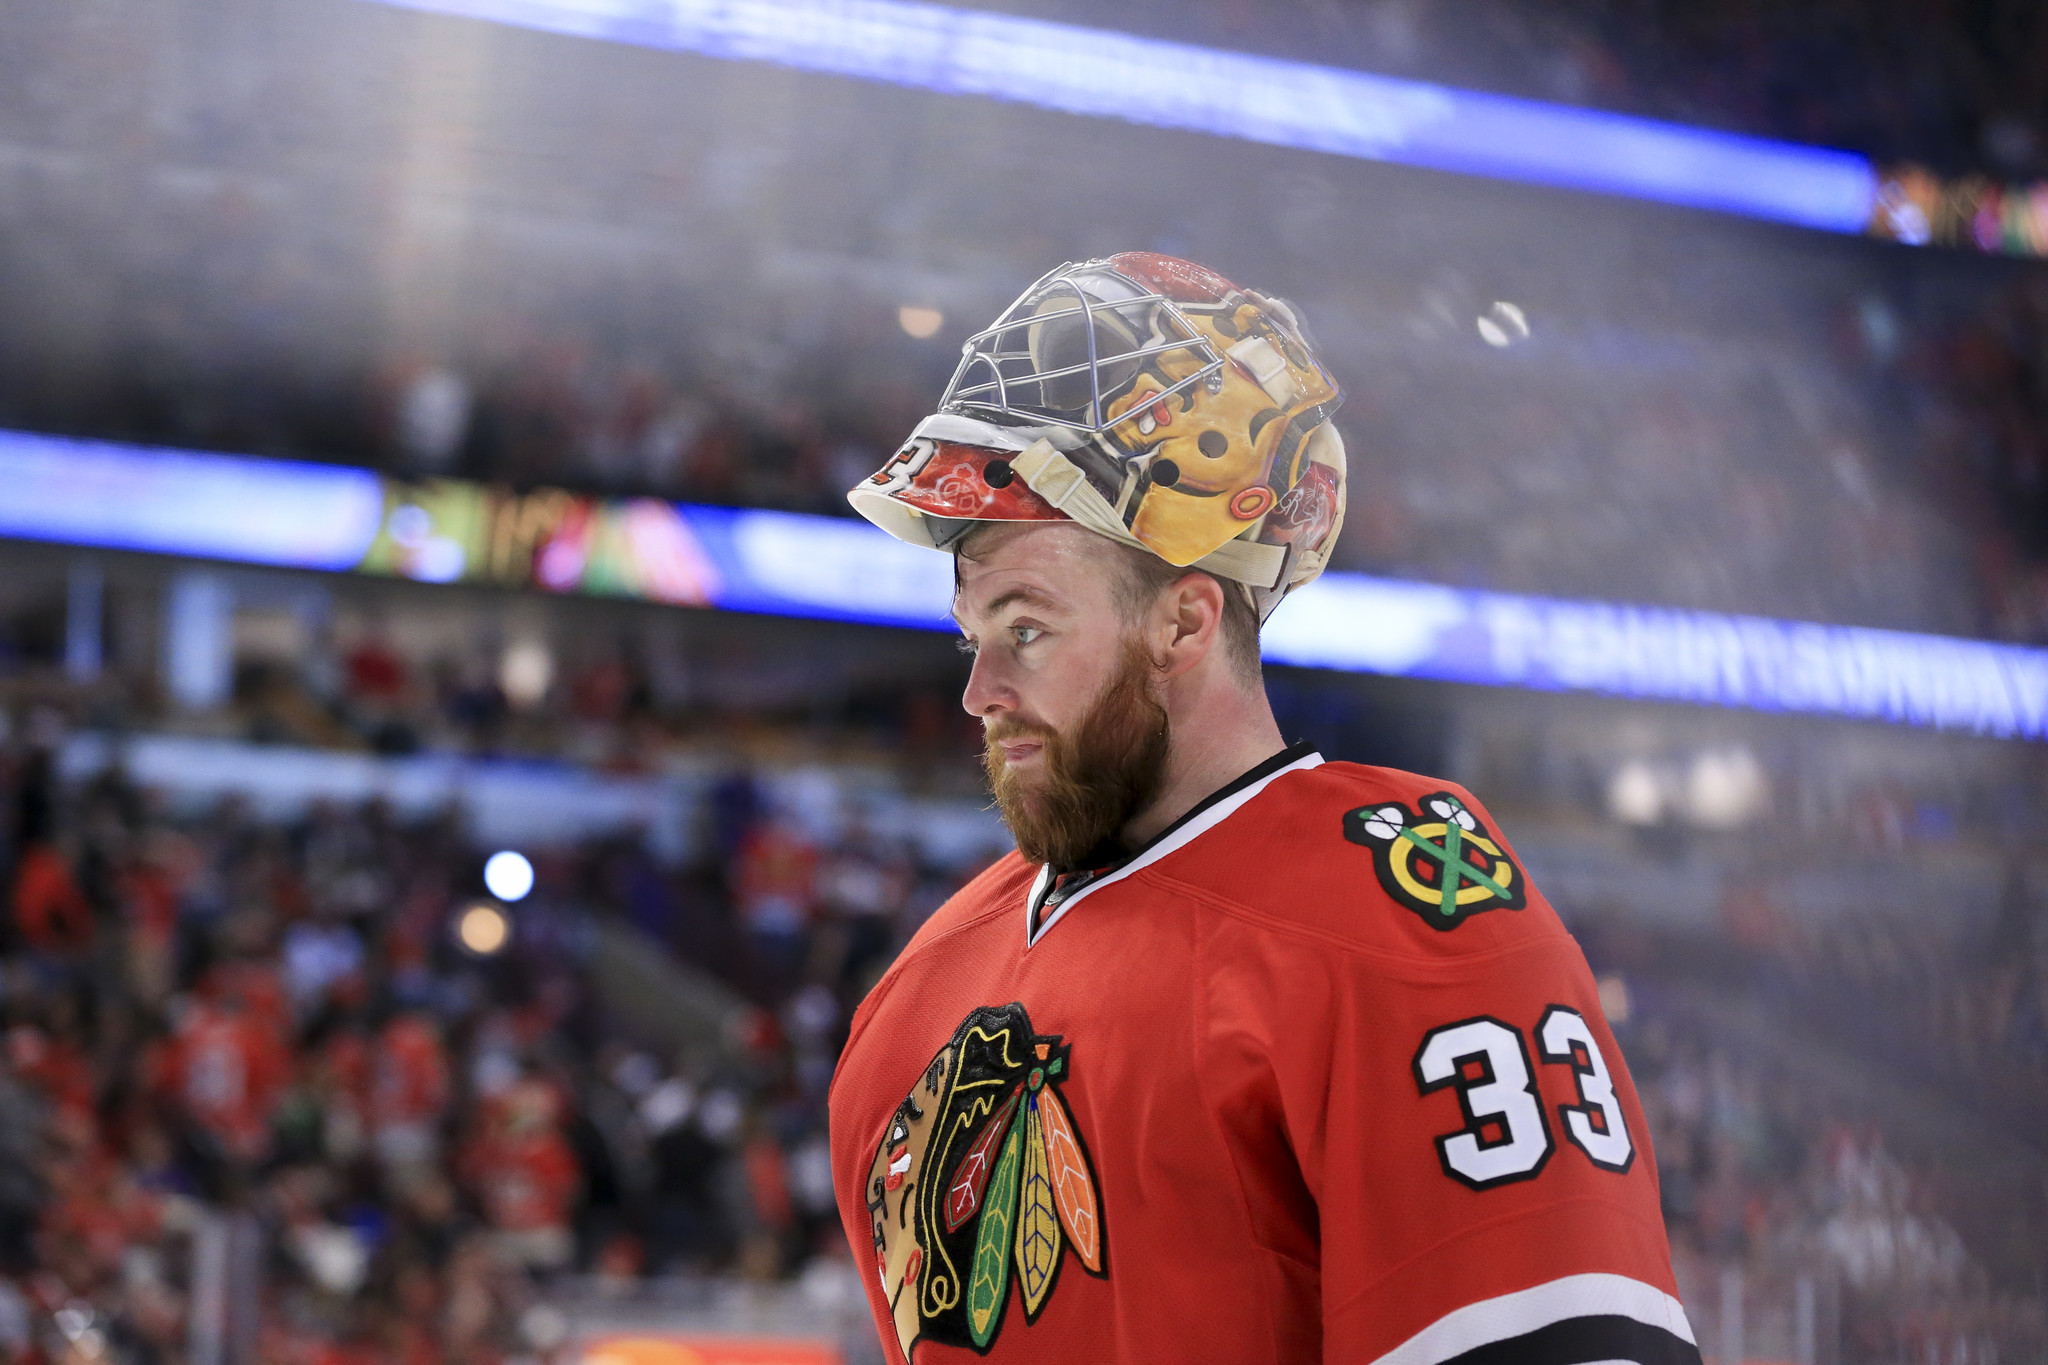 Blackhawks trade goalie Scott Darling to Hurricanes for third round-draft  pick - Chicago Tribune 8fede5684